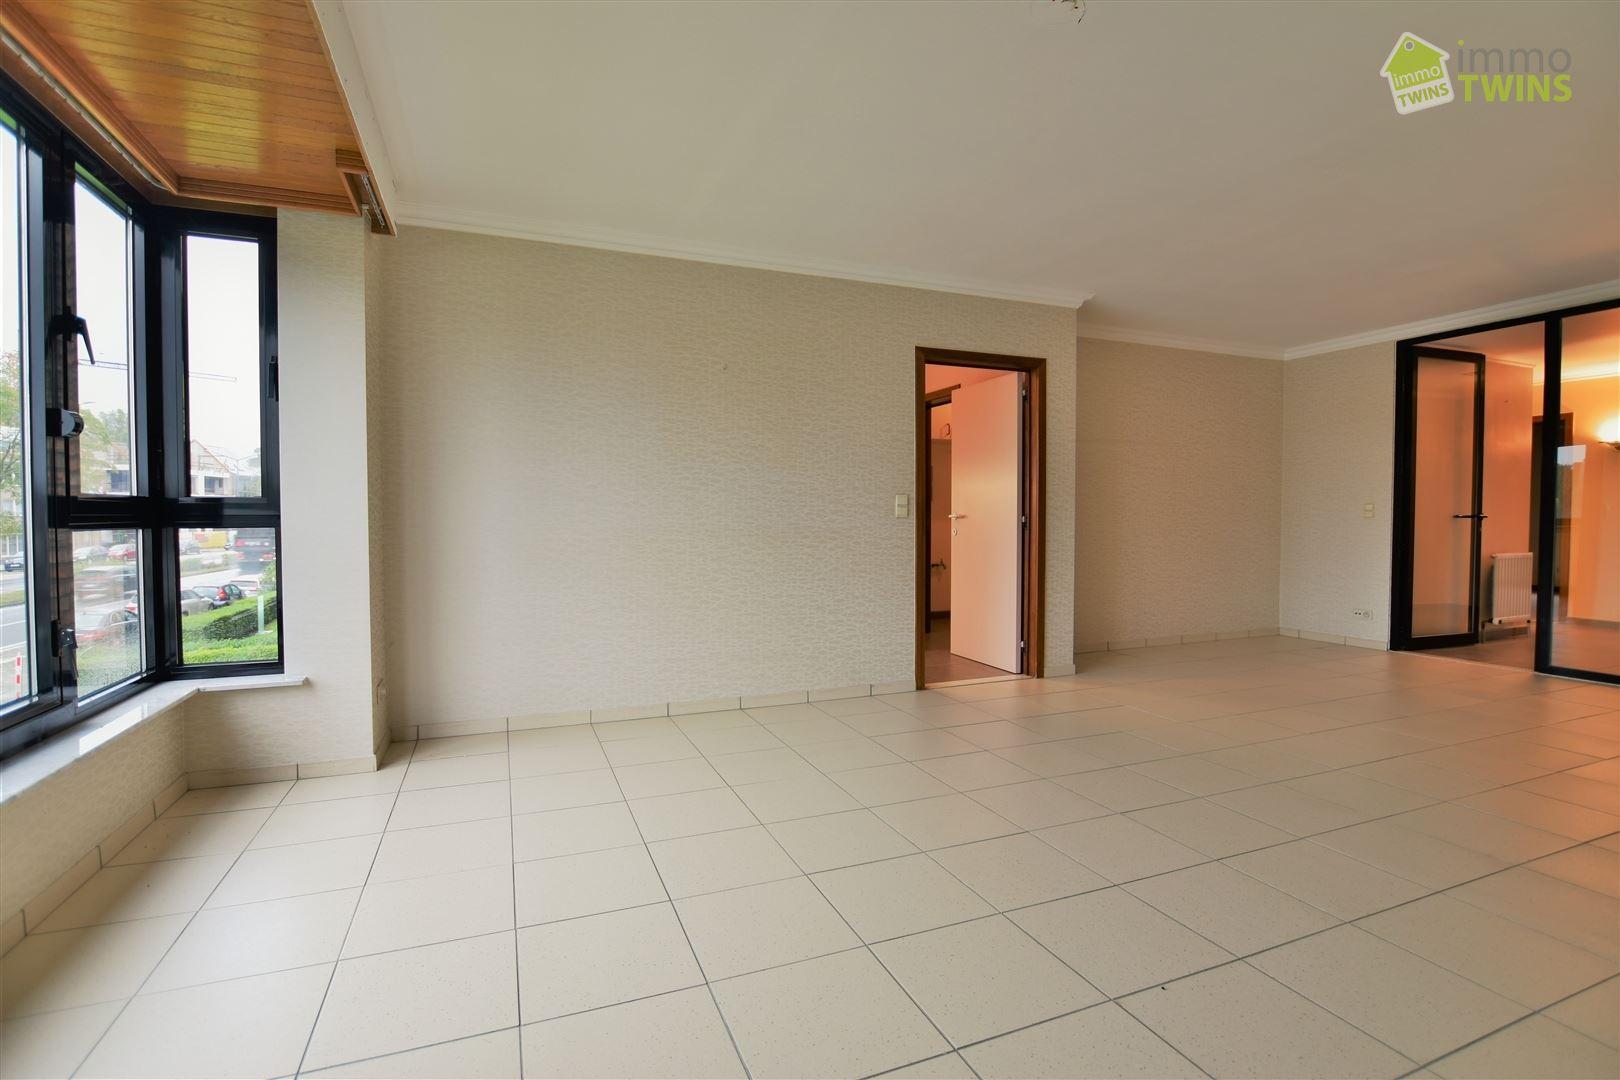 Foto 3 : Appartement te 9200 DENDERMONDE (België) - Prijs € 725